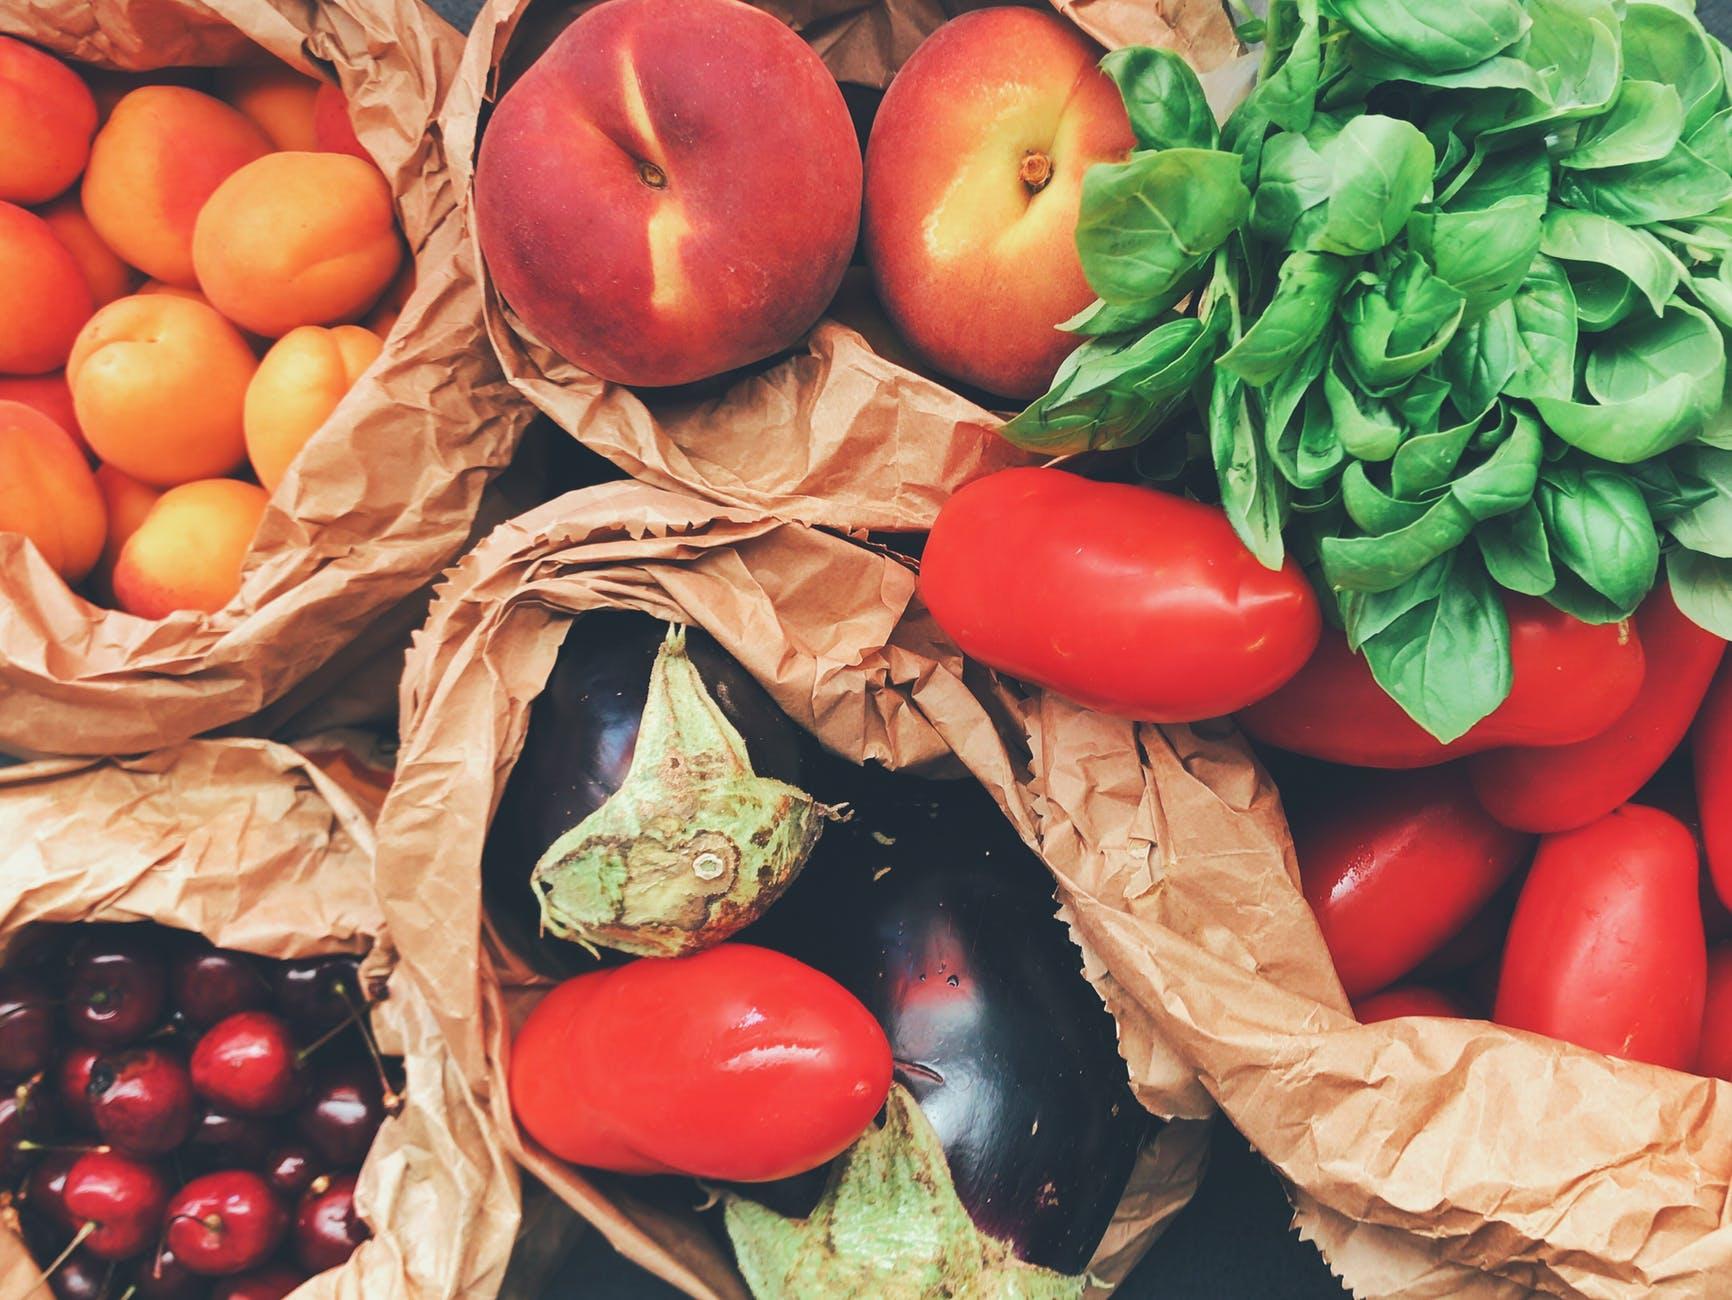 fall vegetables, fall fruits, pant,fall,